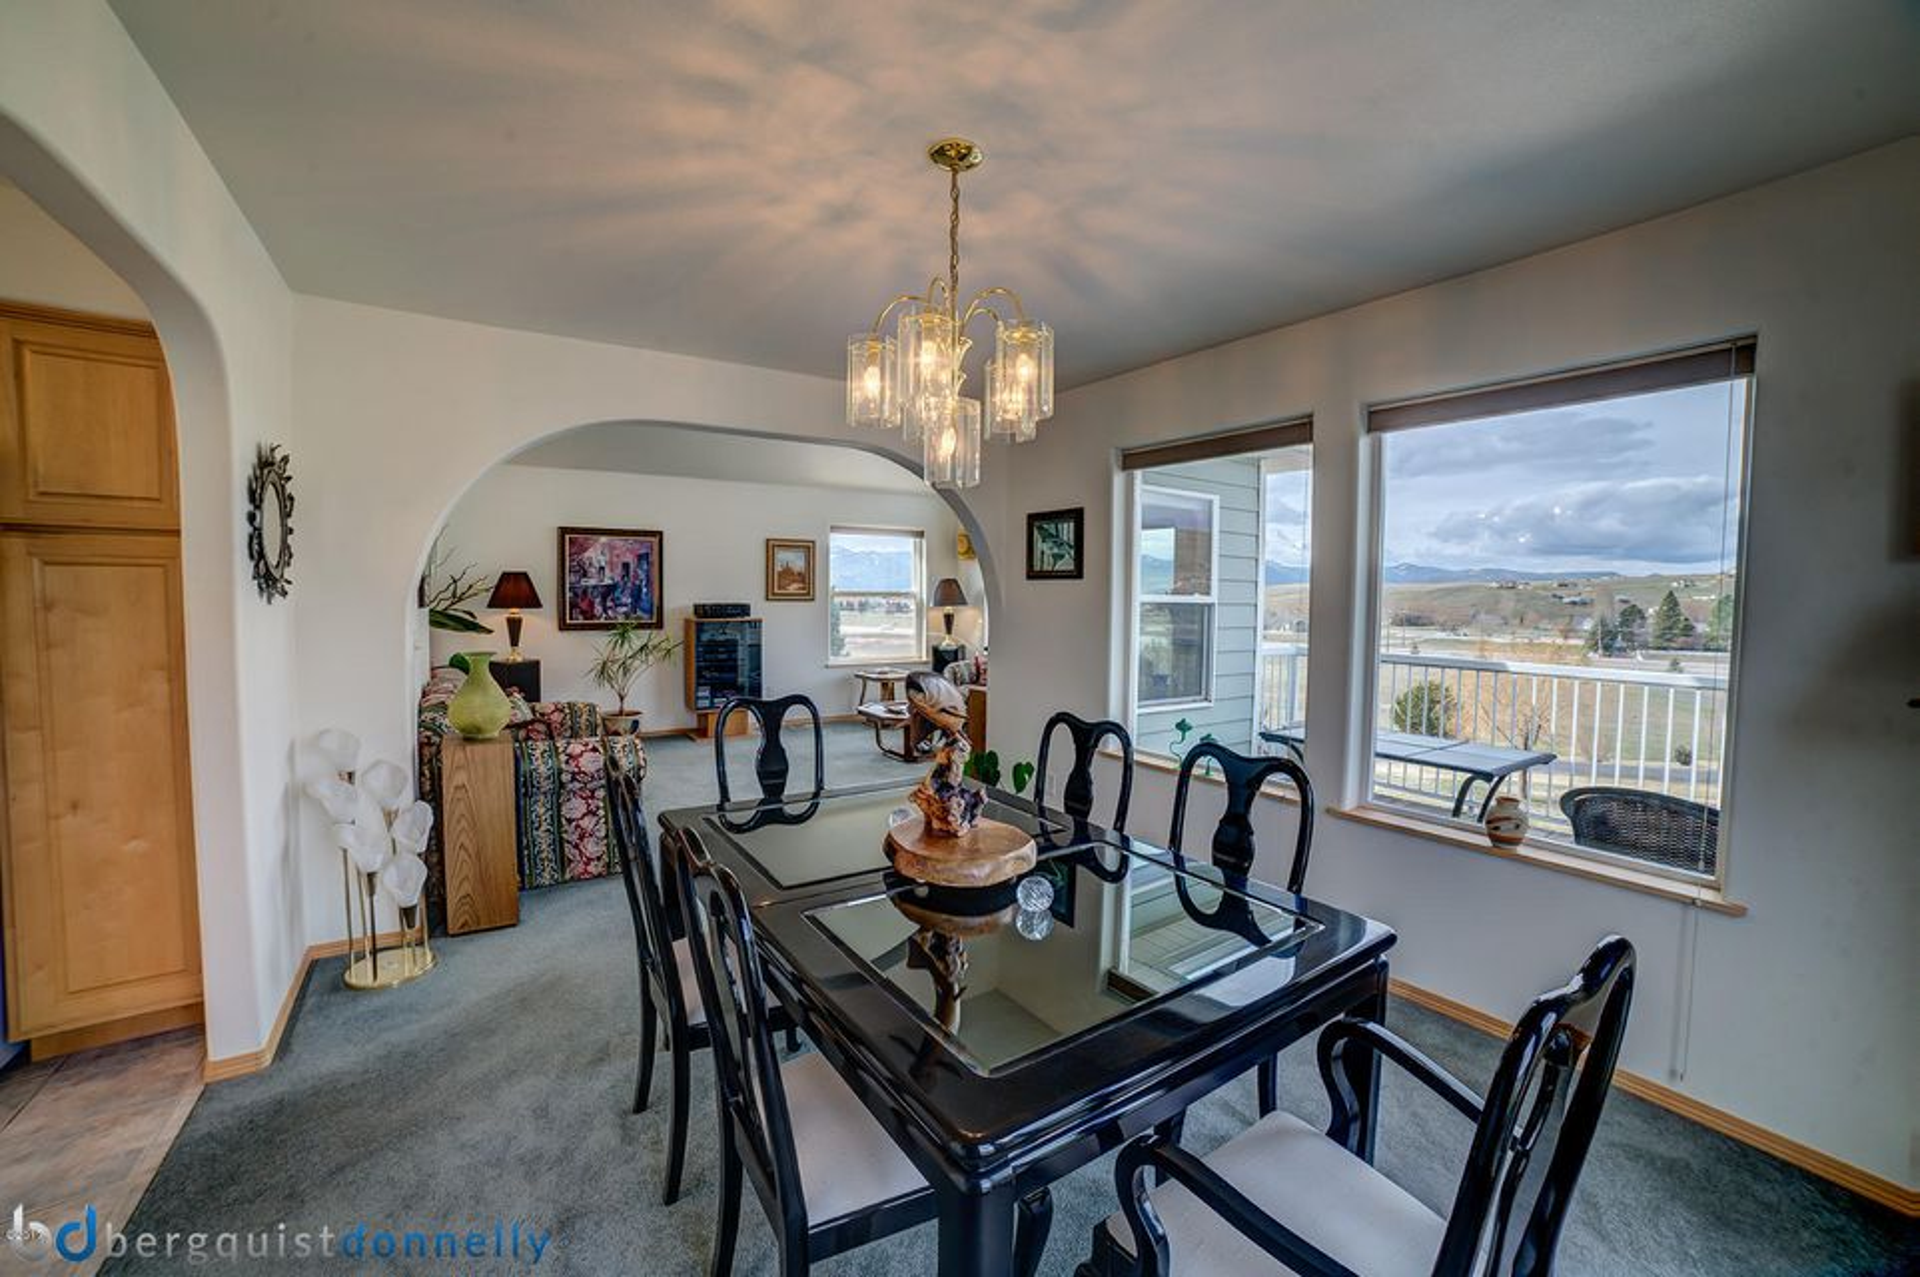 Additional photo for property listing at 9549 Shikane Lane 9549 Shikane Lane Missoula, Montana 59808 United States